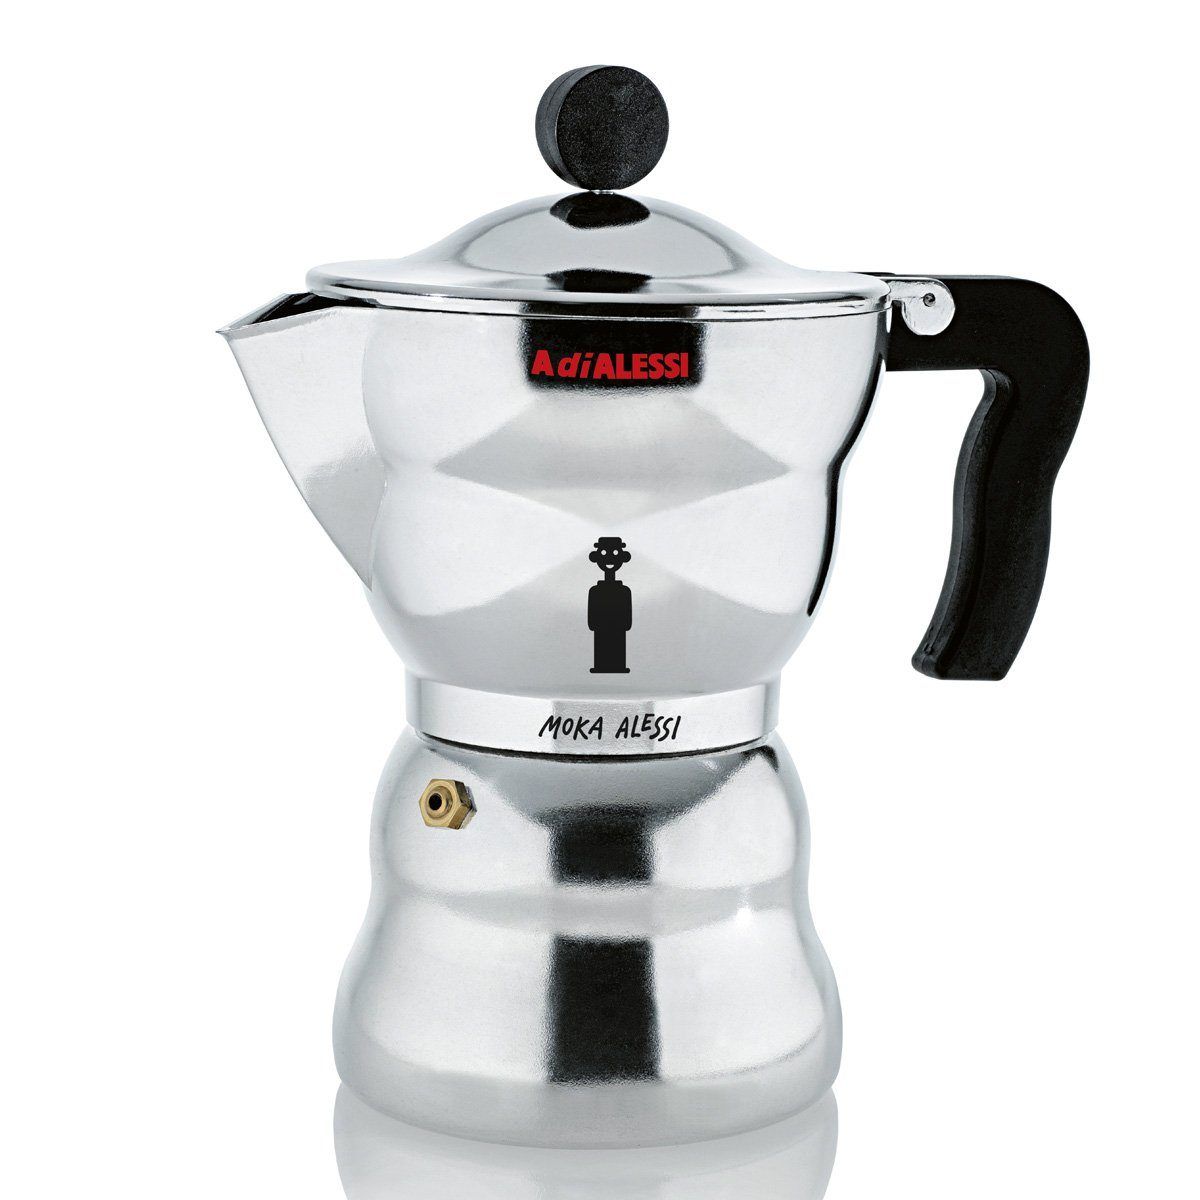 Alessi Alessi Espressomaschine MOKA ALESSI 6 Tassen